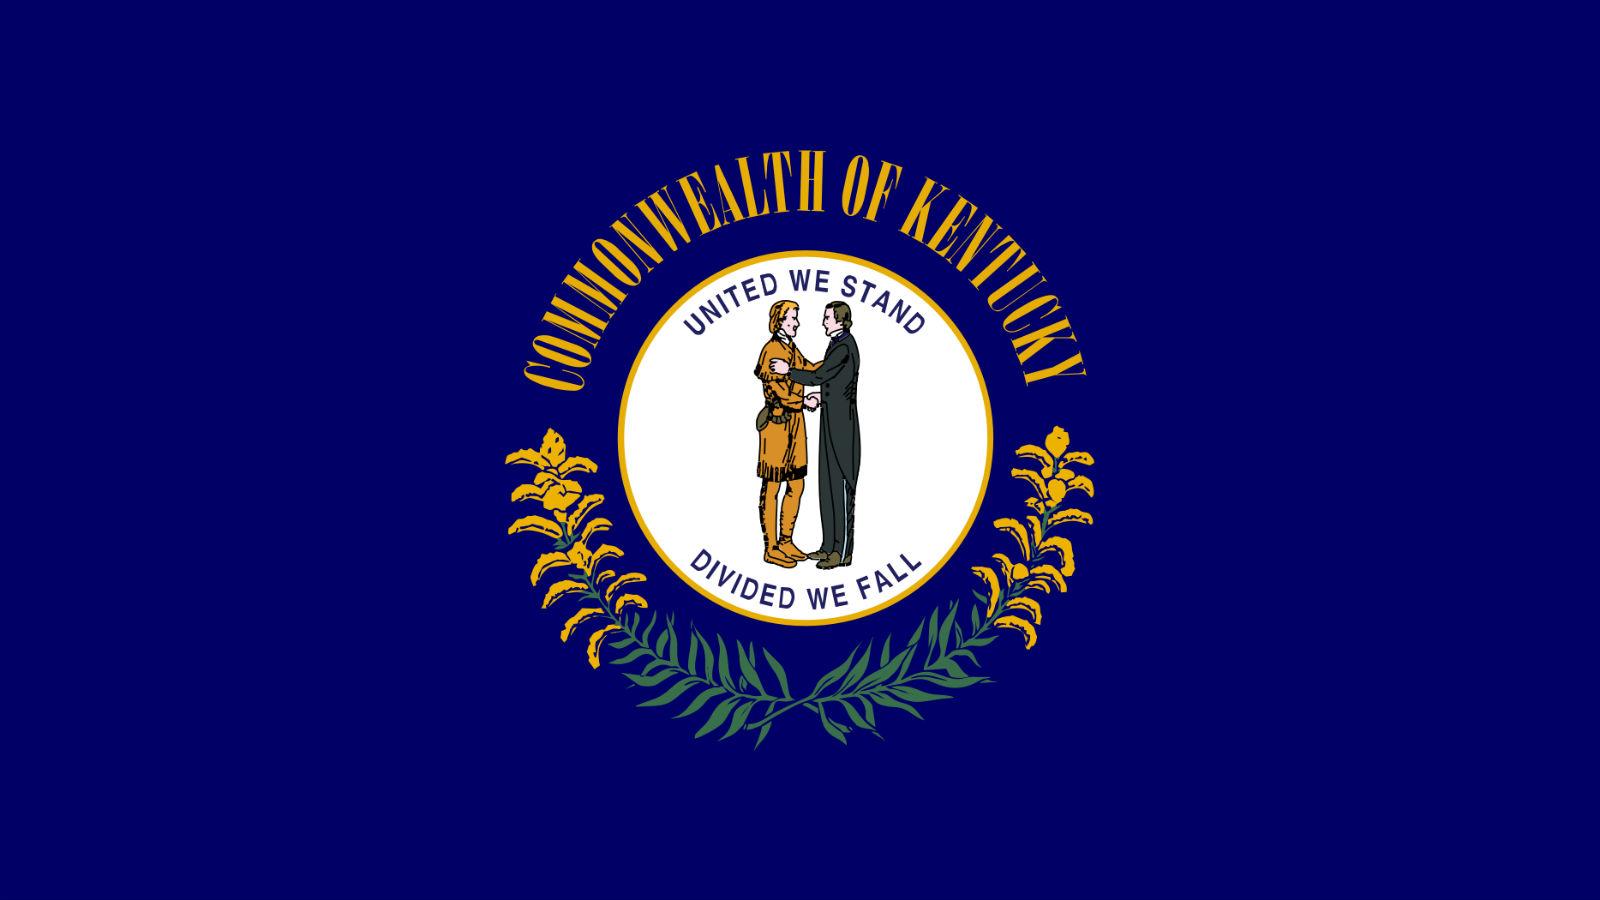 Kentucky Legislative Session Begins With Slate of Anti-LGBTQ Bills